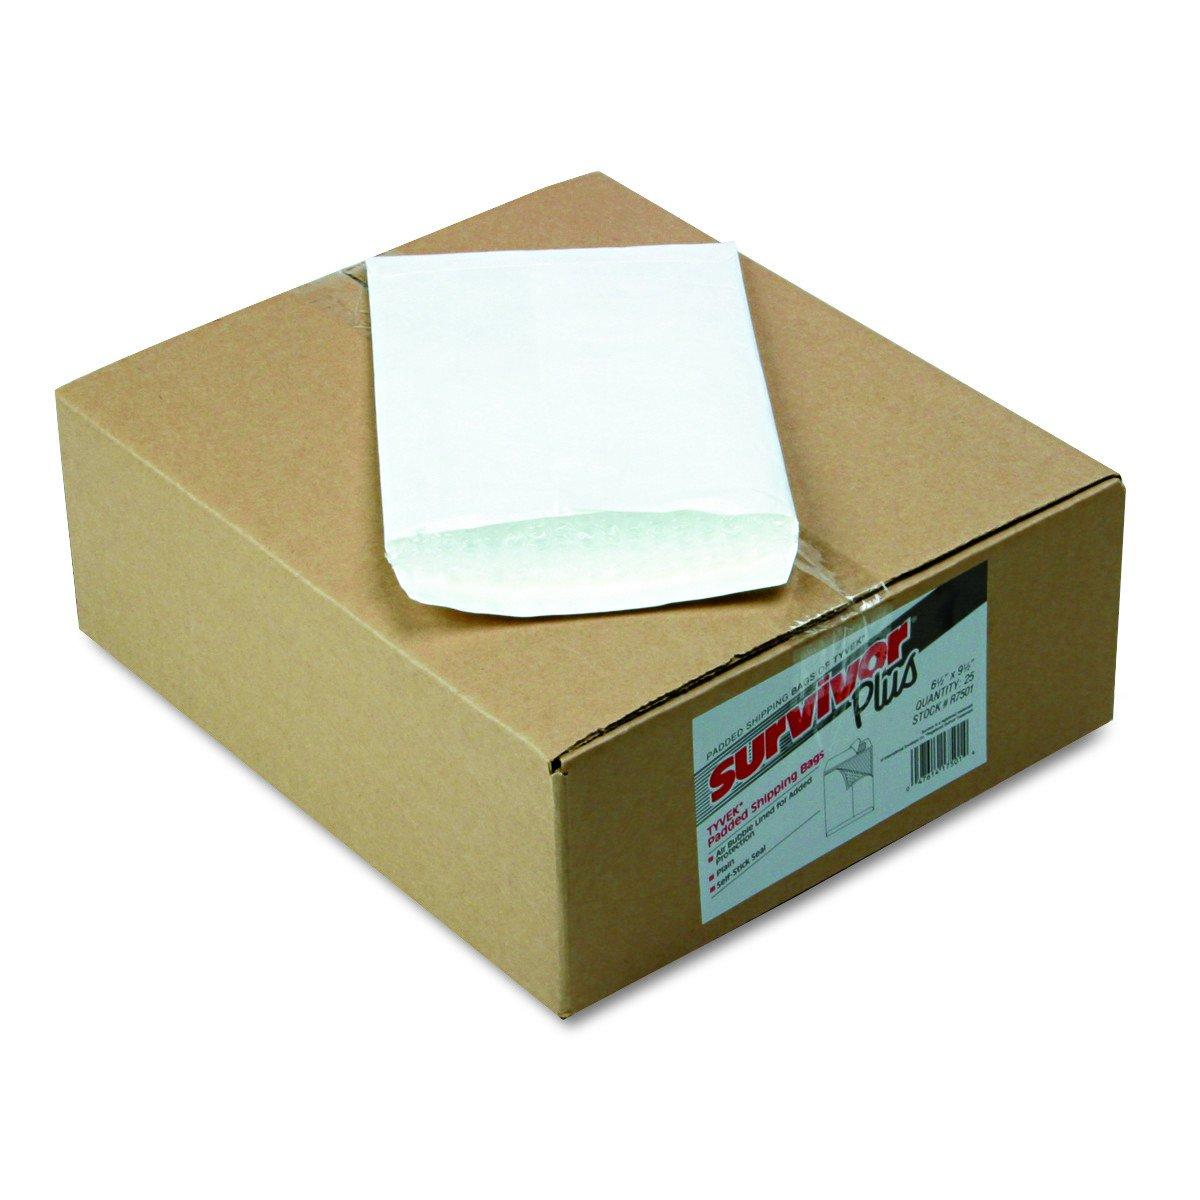 Quality Park R7501 Tyvek burbuja de aire Mailer Auto-Seal Side Seam 6 1/2 x 9 1/2 25/caja Blanco